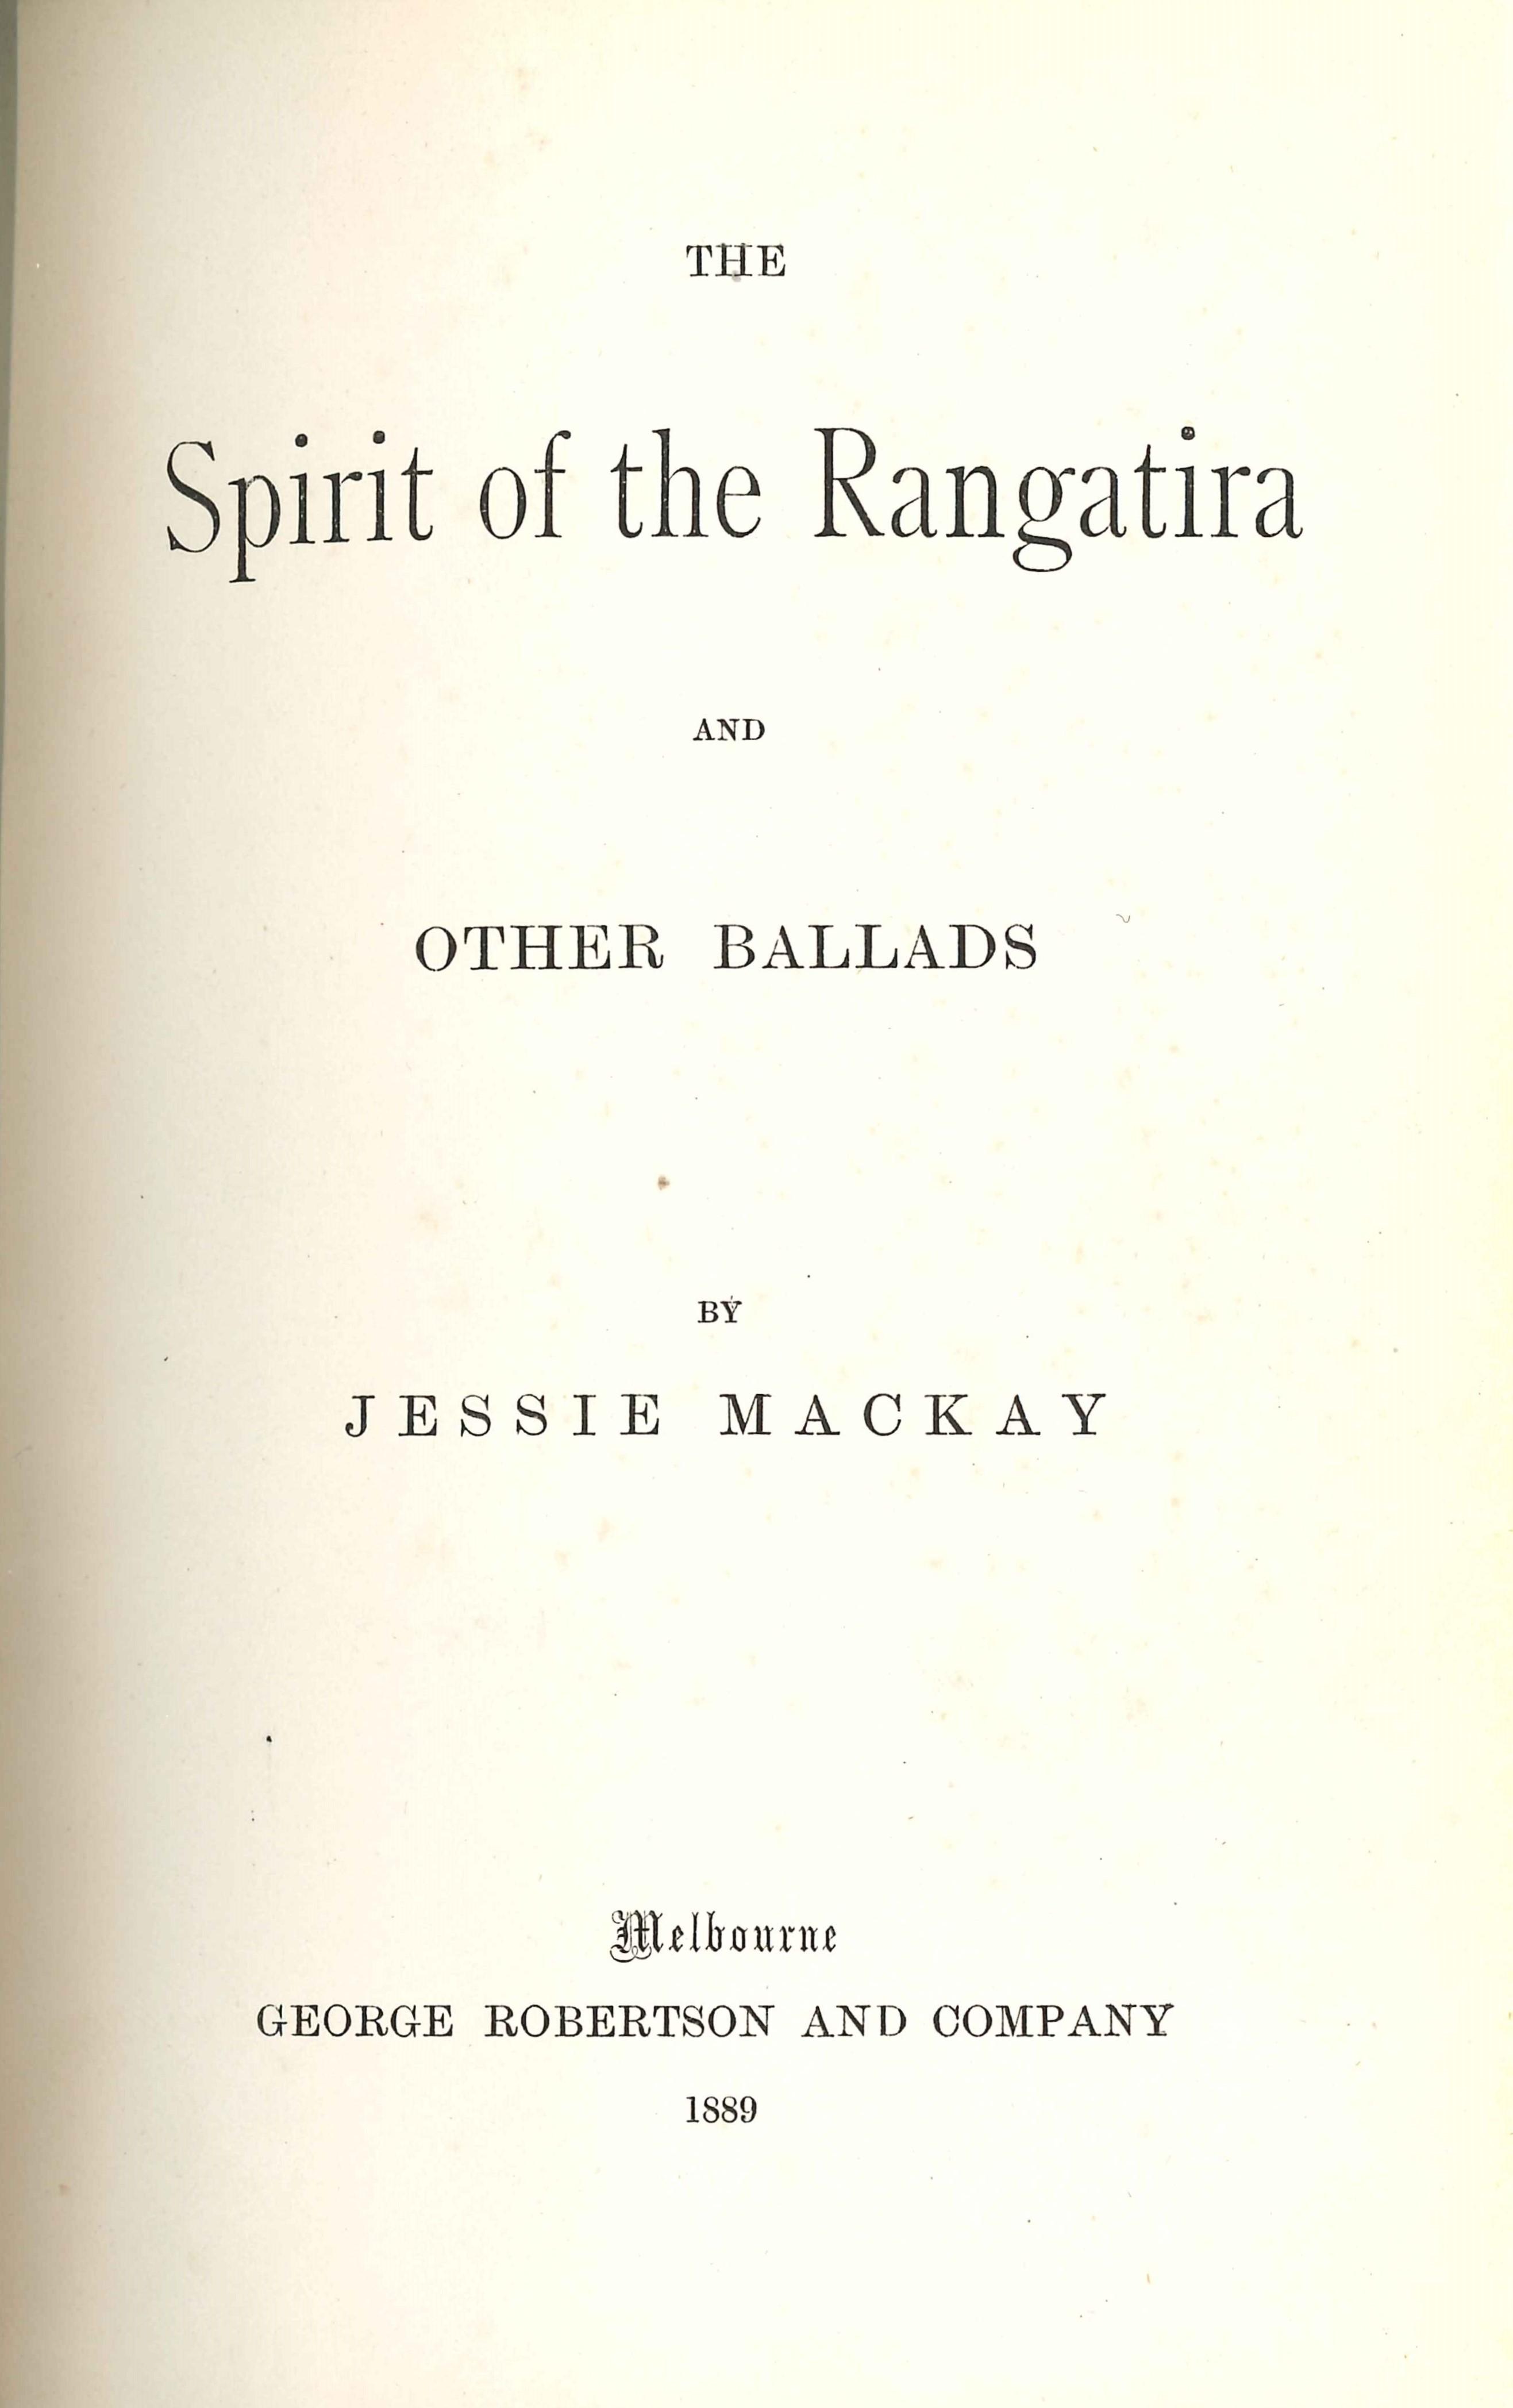 Jessie Mackay. The spirit of the rangatira and other ballads. Melbourne: Robertson, 1889.